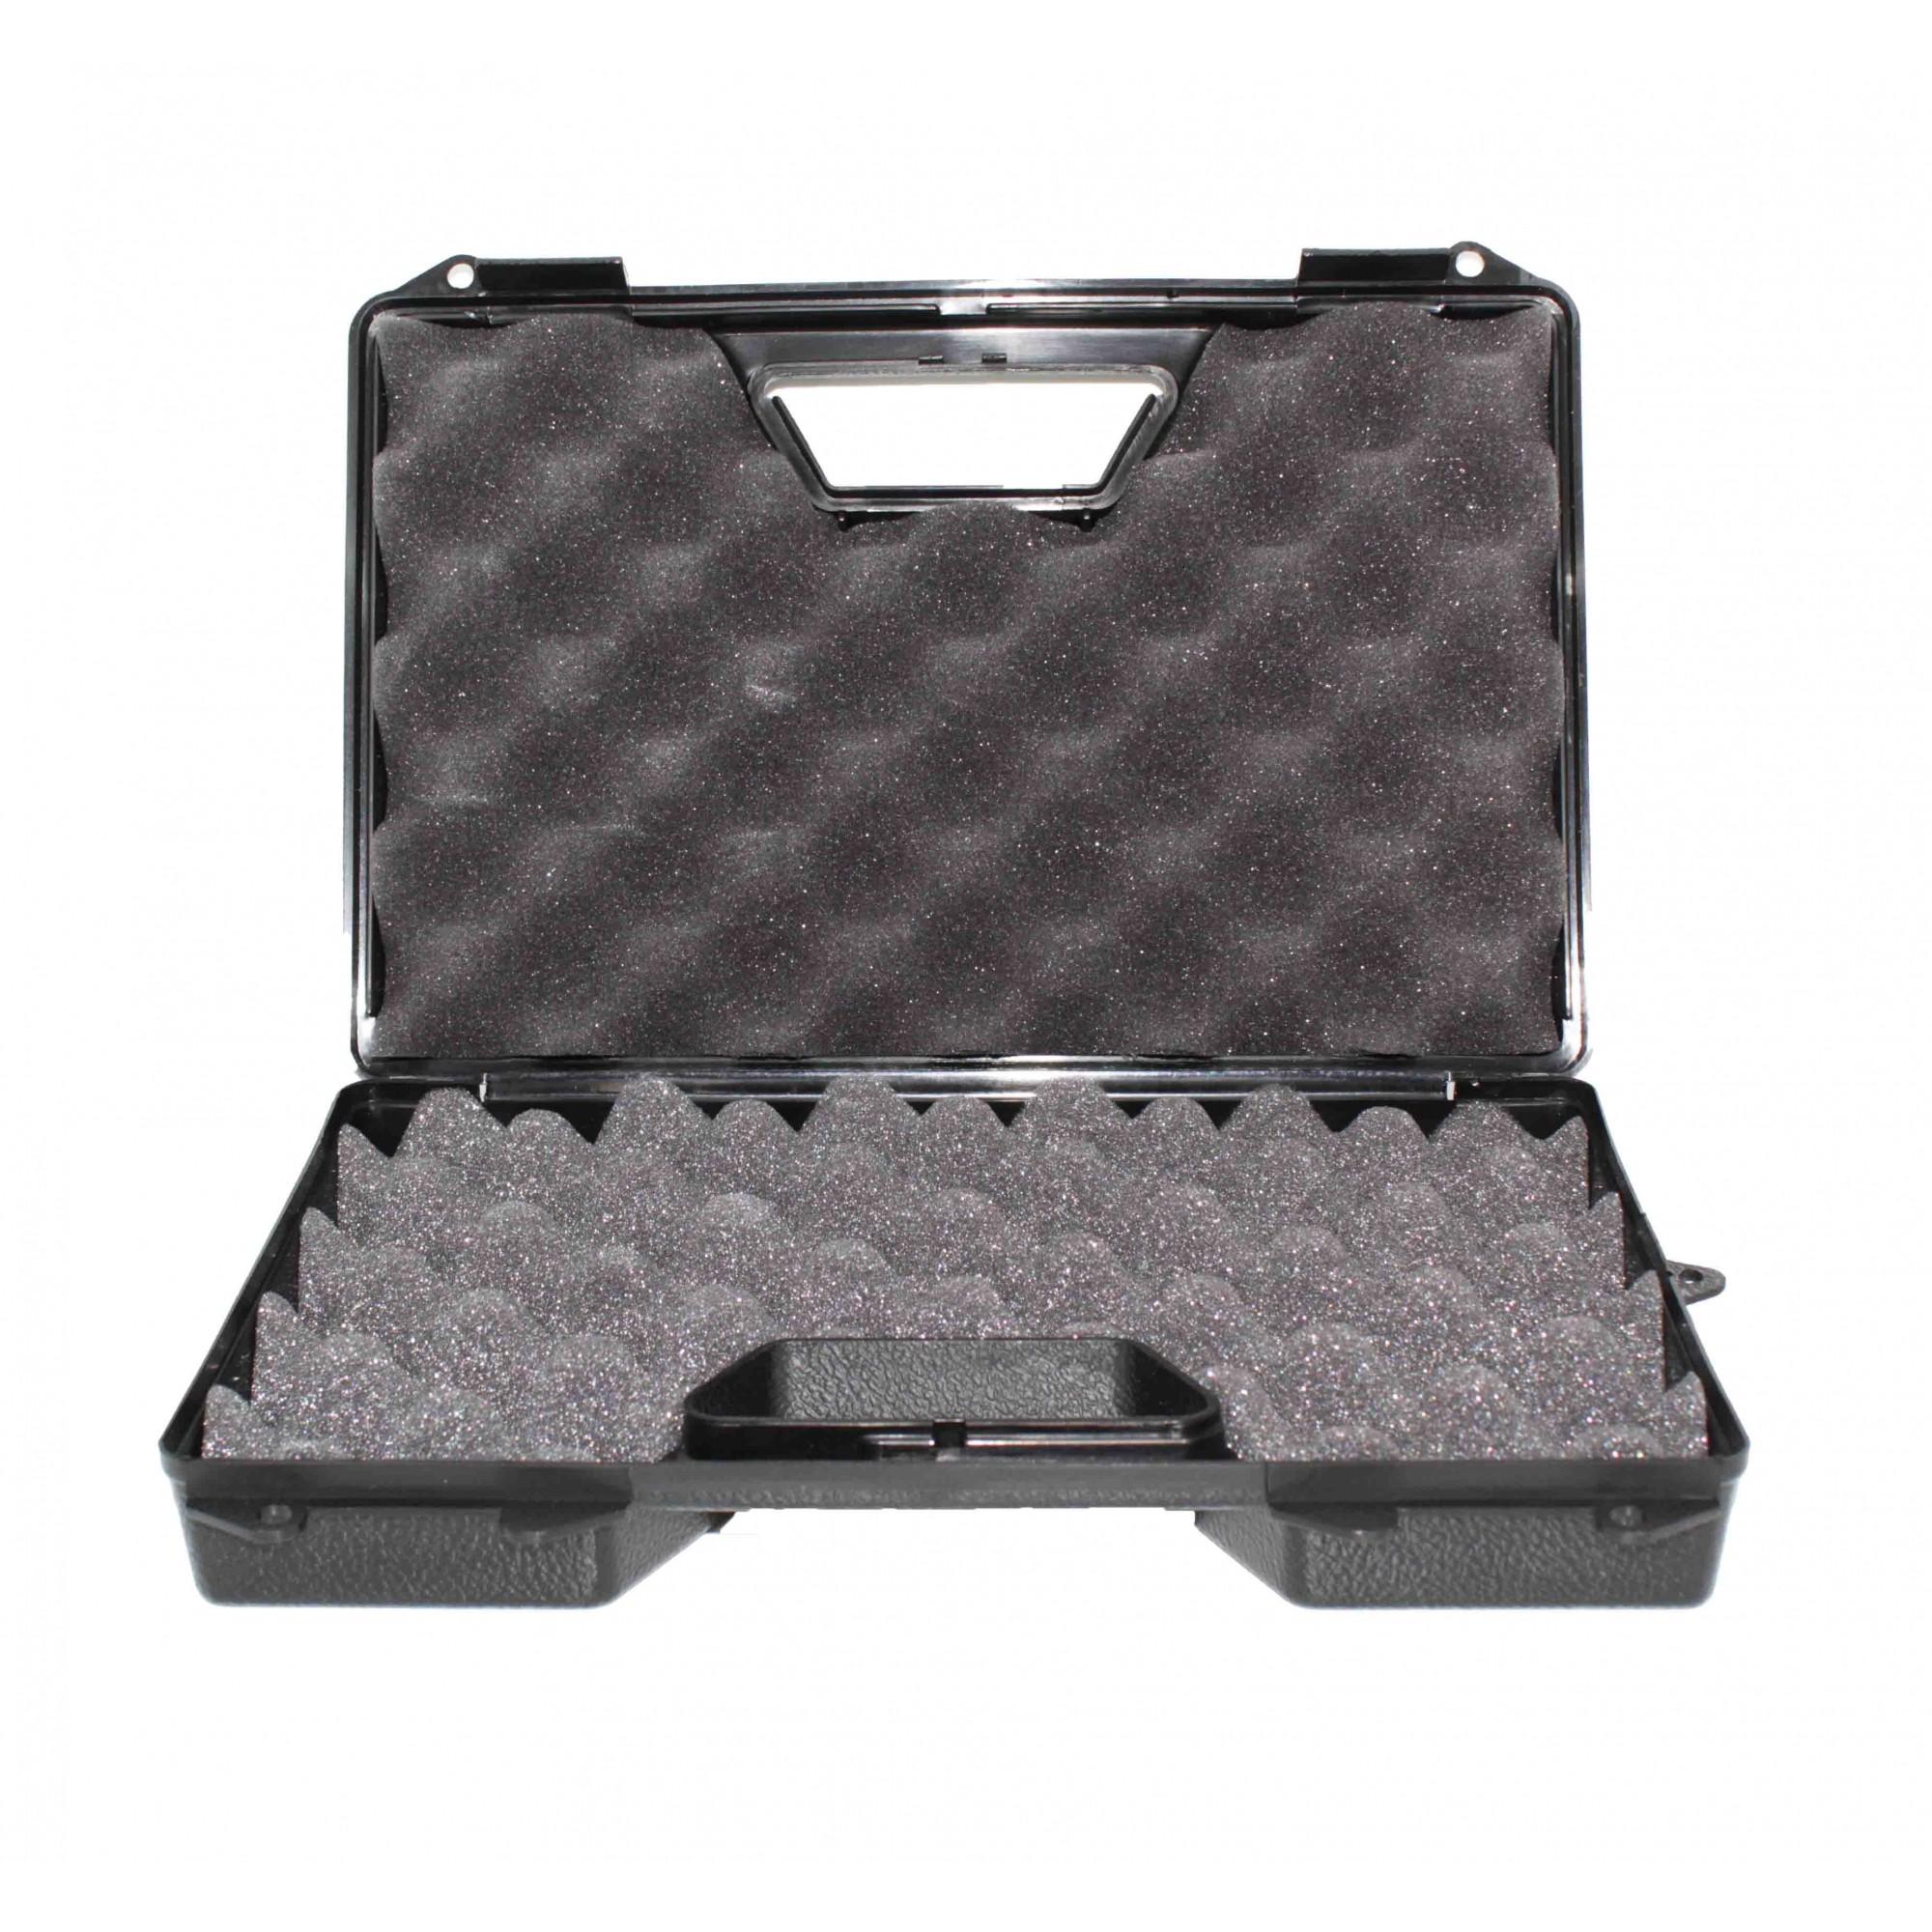 Maleta Case Rigida Para Armas 806